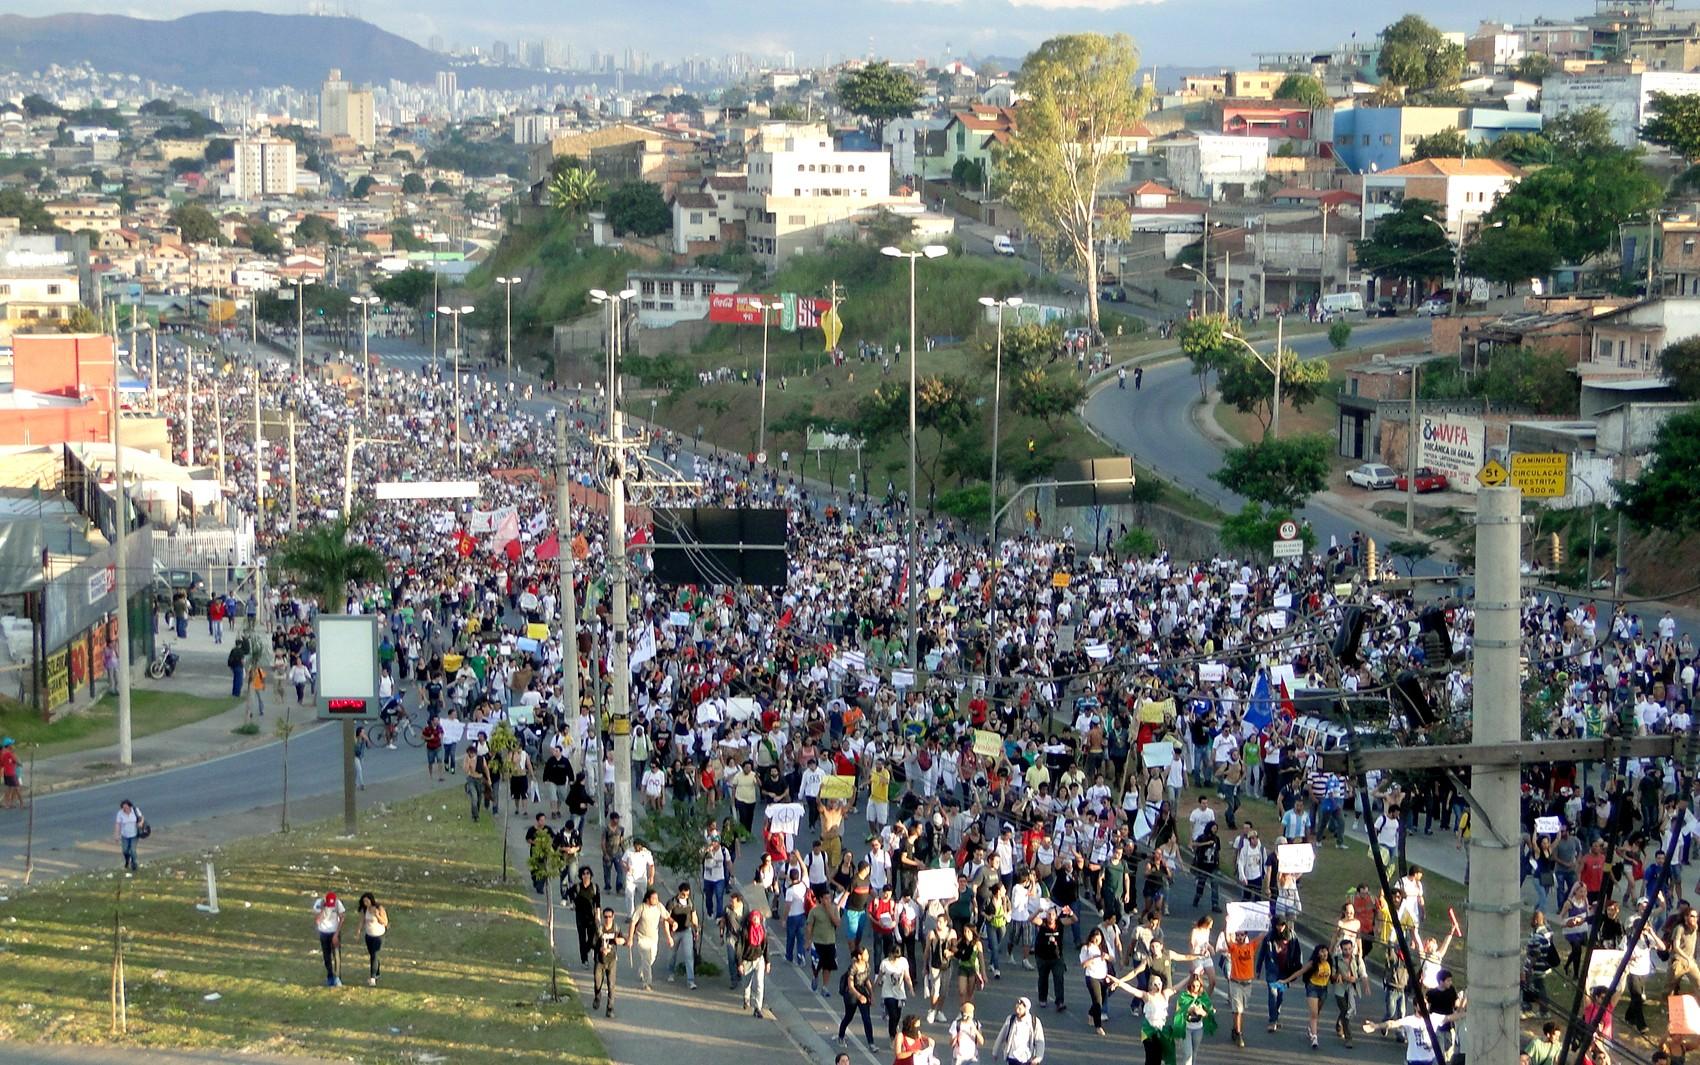 Manifestação na Avenida Antônio Carlos (Foto: Humberto Trajano/G1)